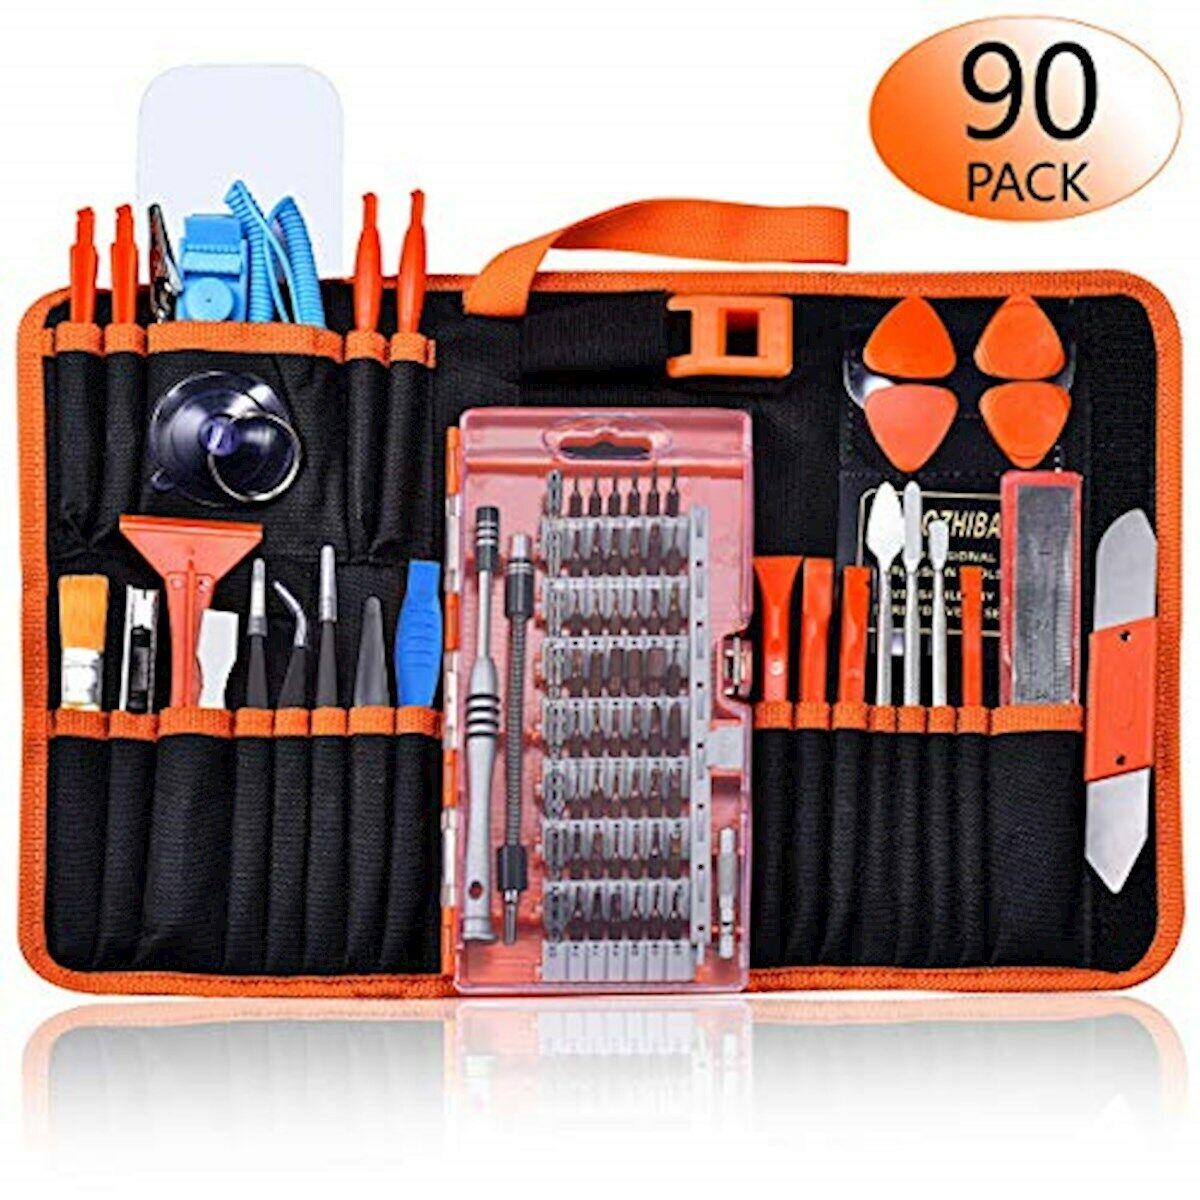 90pcs electronics repair tool kit professional precision